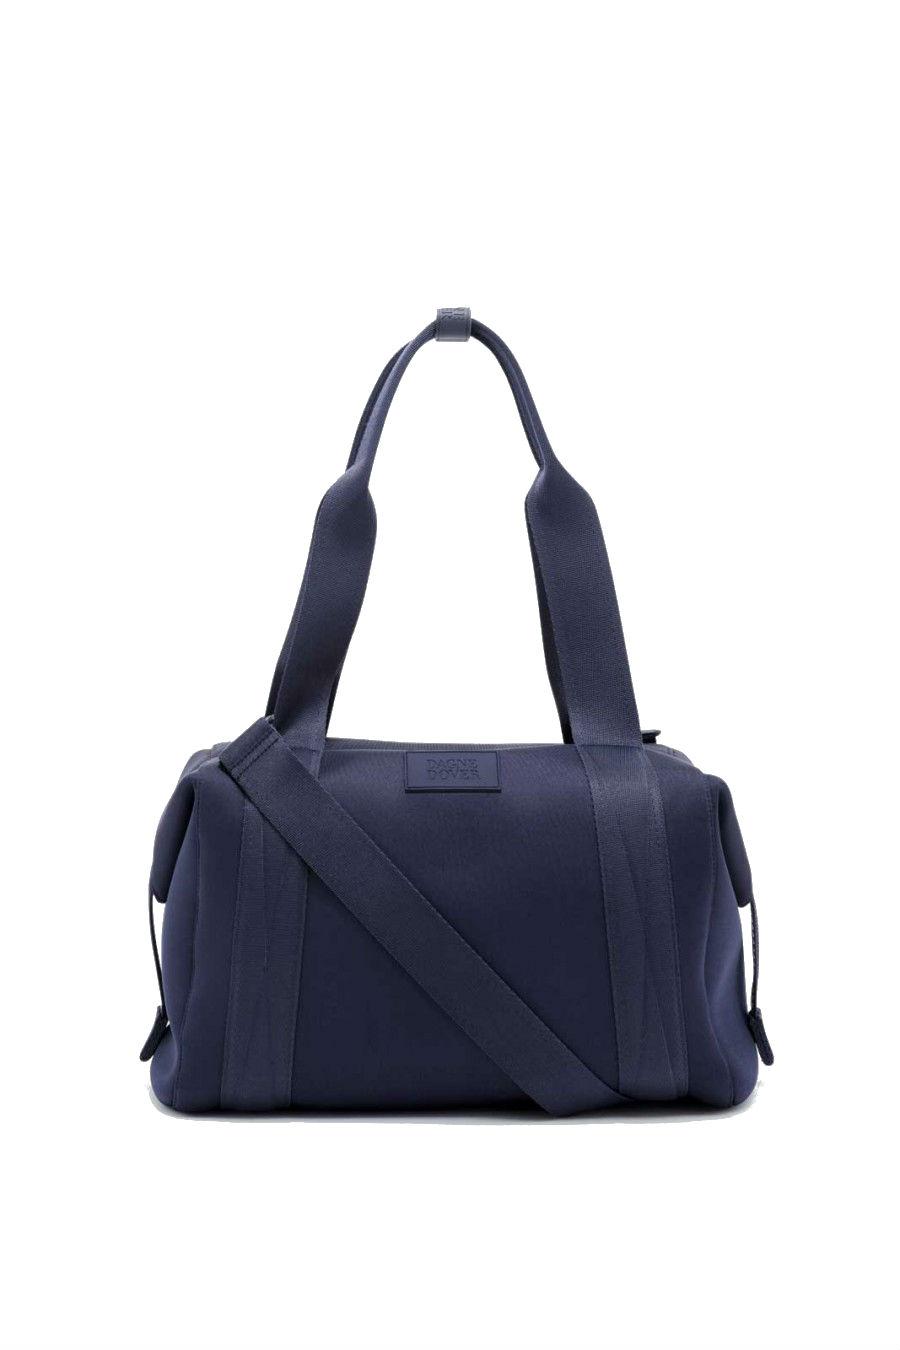 A Navy Dagne Dover Gym Bag